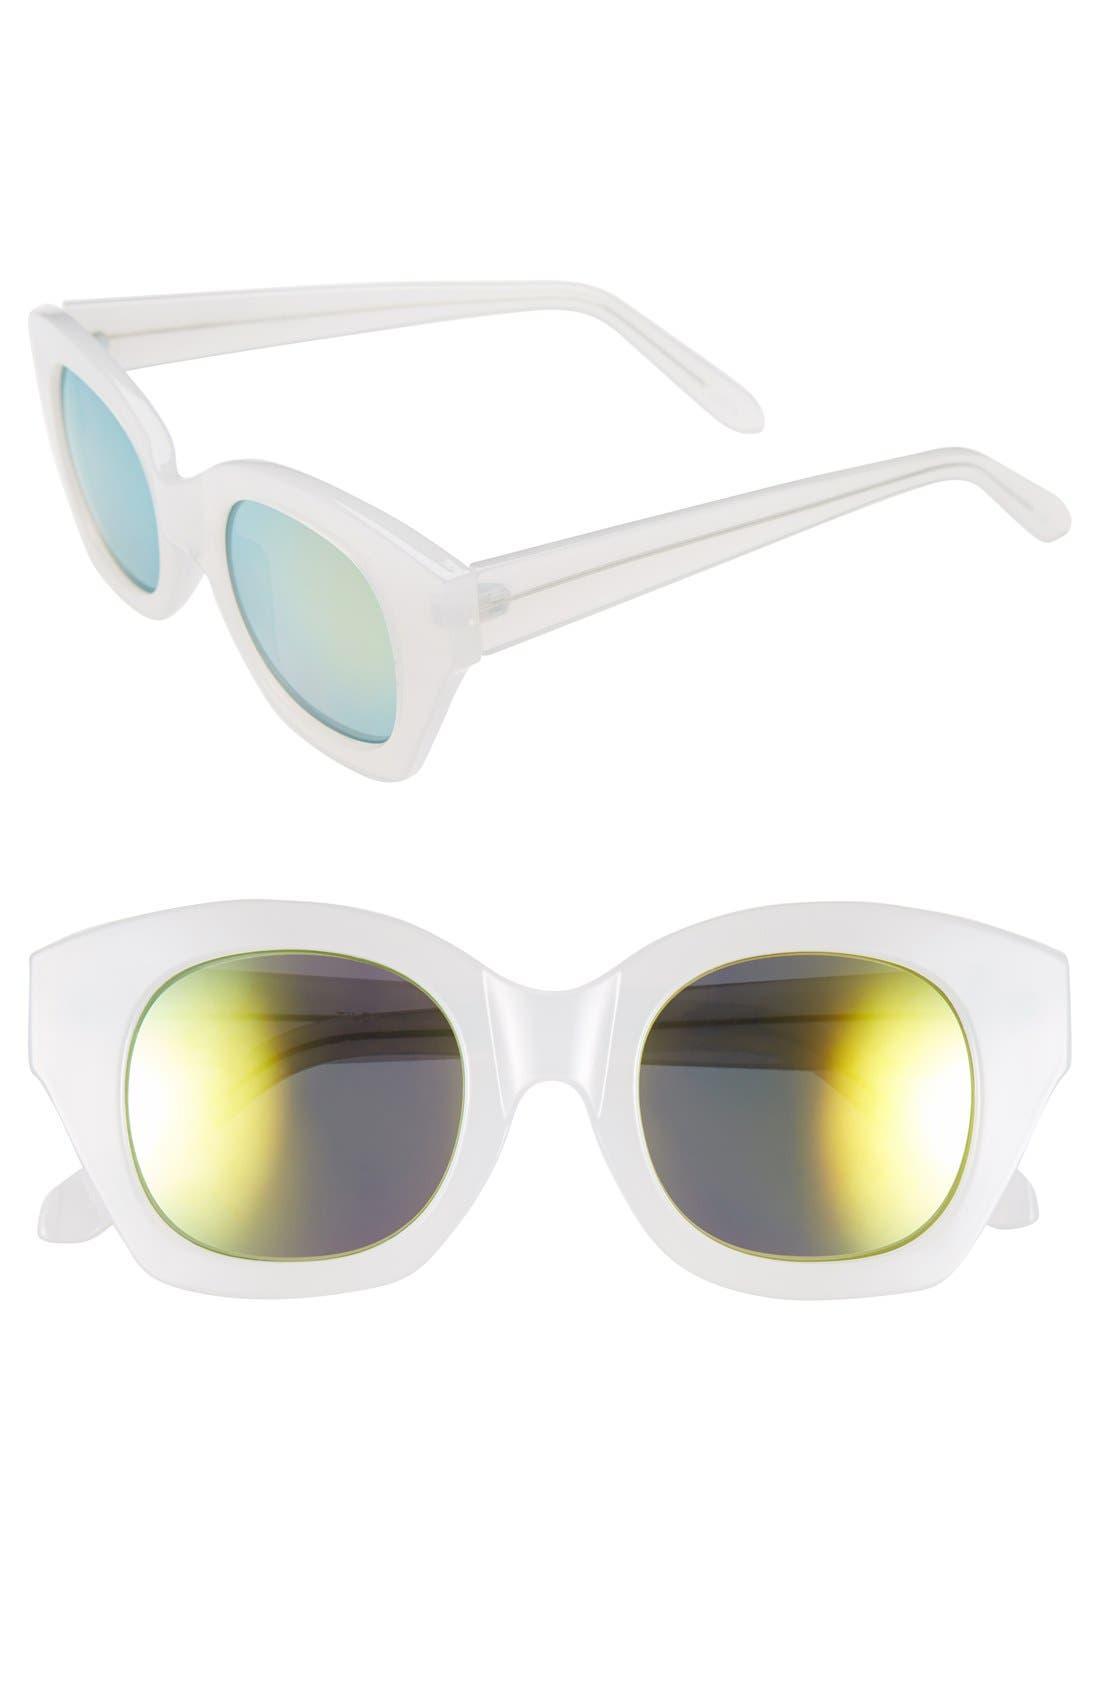 Main Image - Tildon 45mm Retro Sunglasses